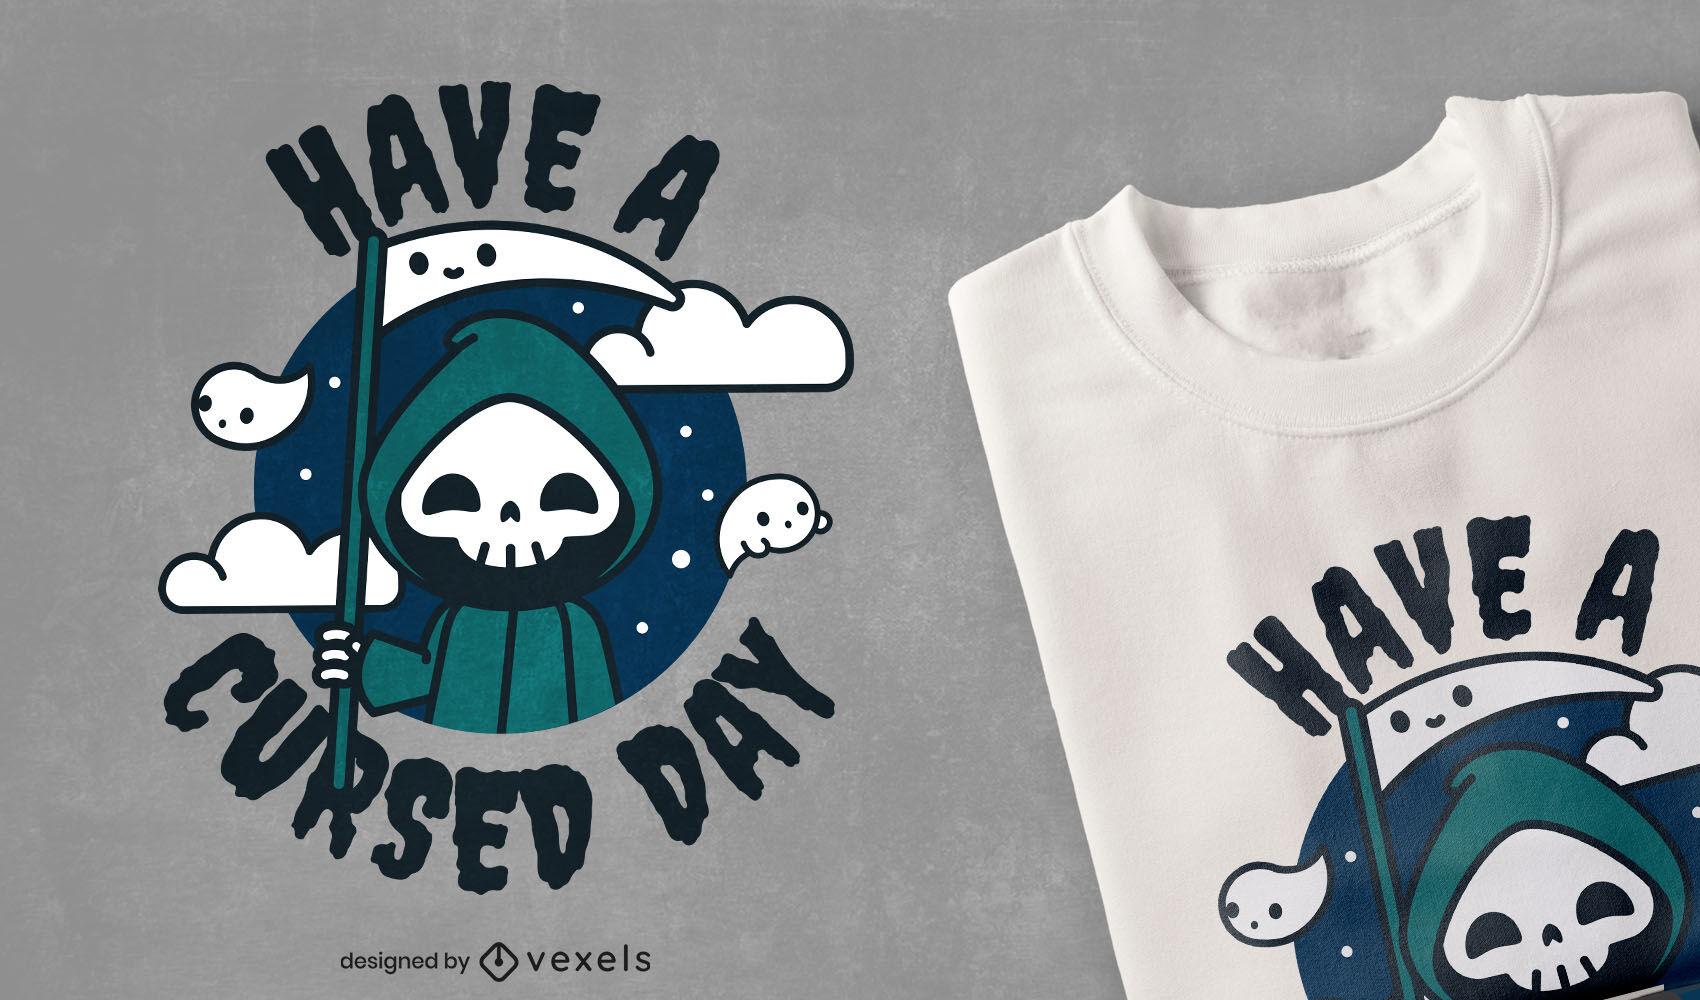 Cute cursed day death t-shirt design